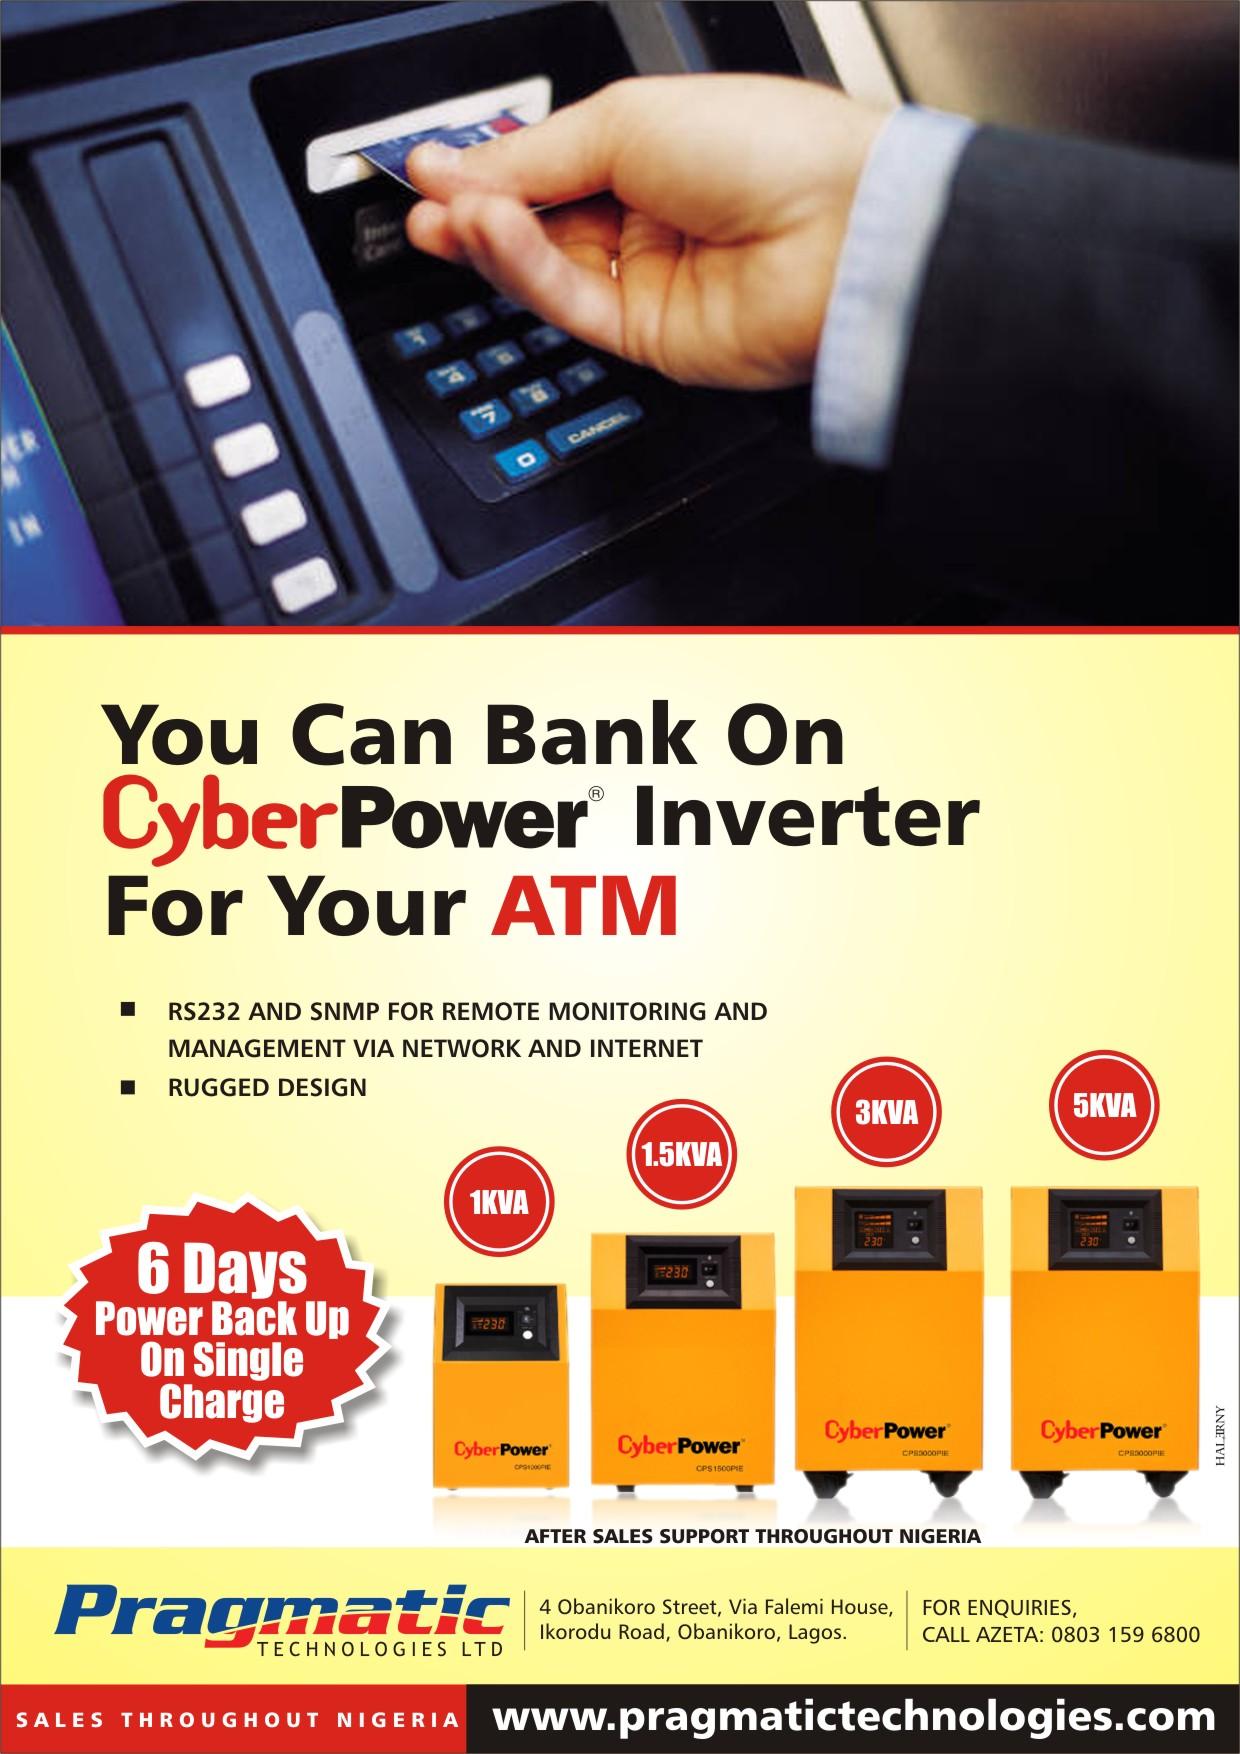 Pragmatic Tech - Cyberpower Inverter